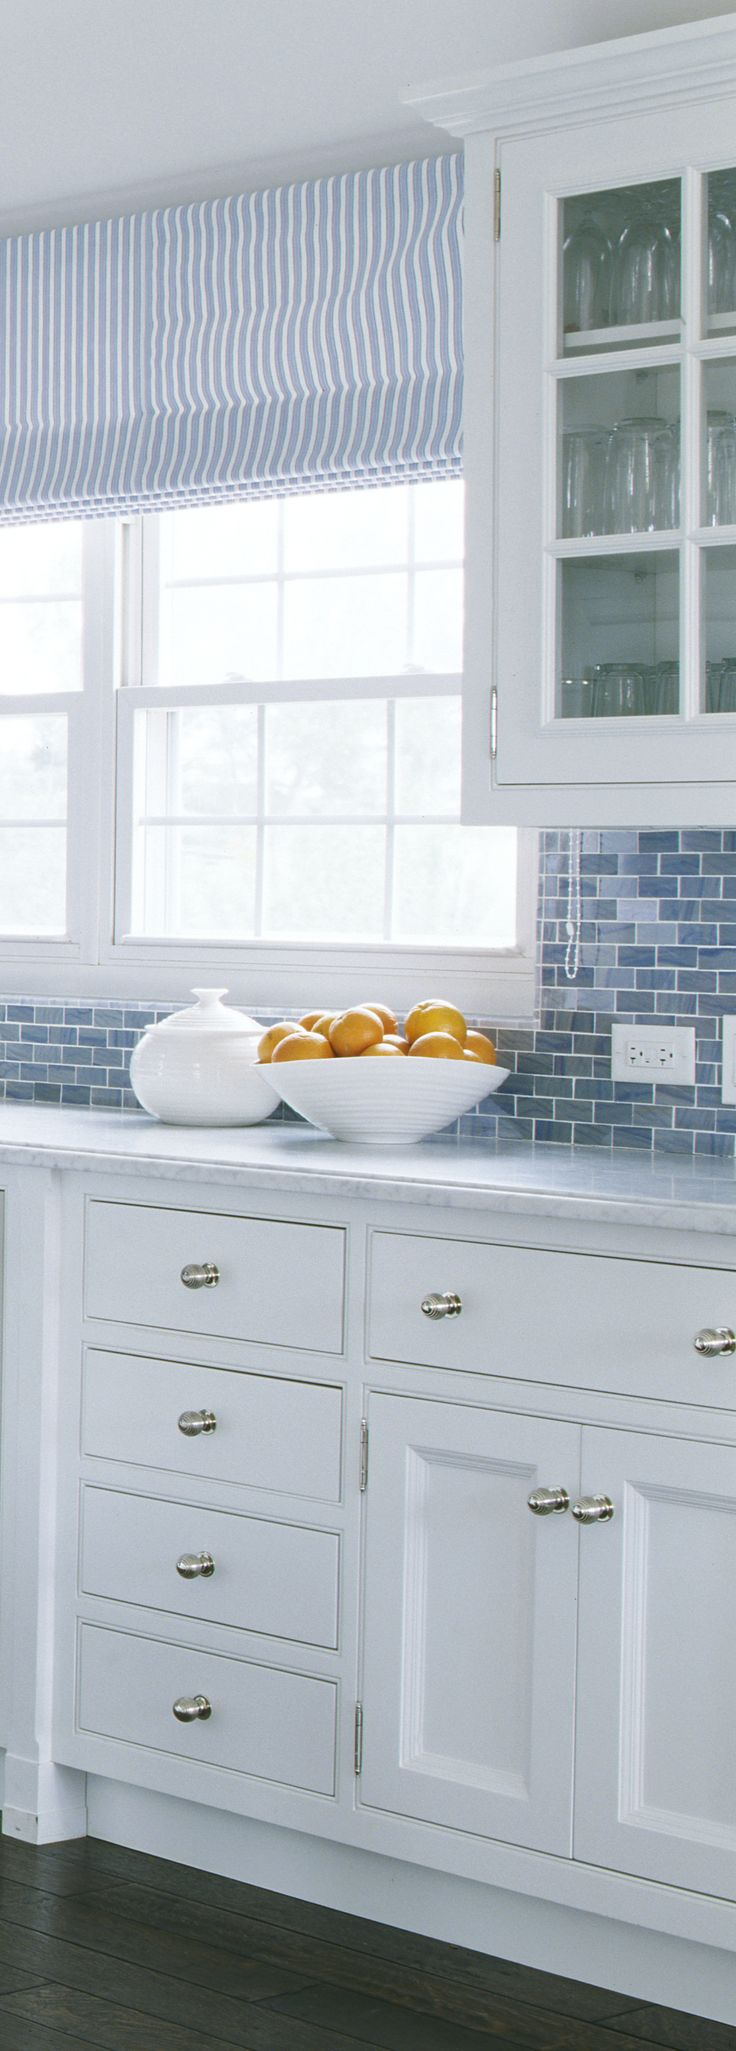 backsplash kitchen gray kitchen cabinets waplag custom white kitchen rich brown cabinetry mosaic tile backsplash hgtv